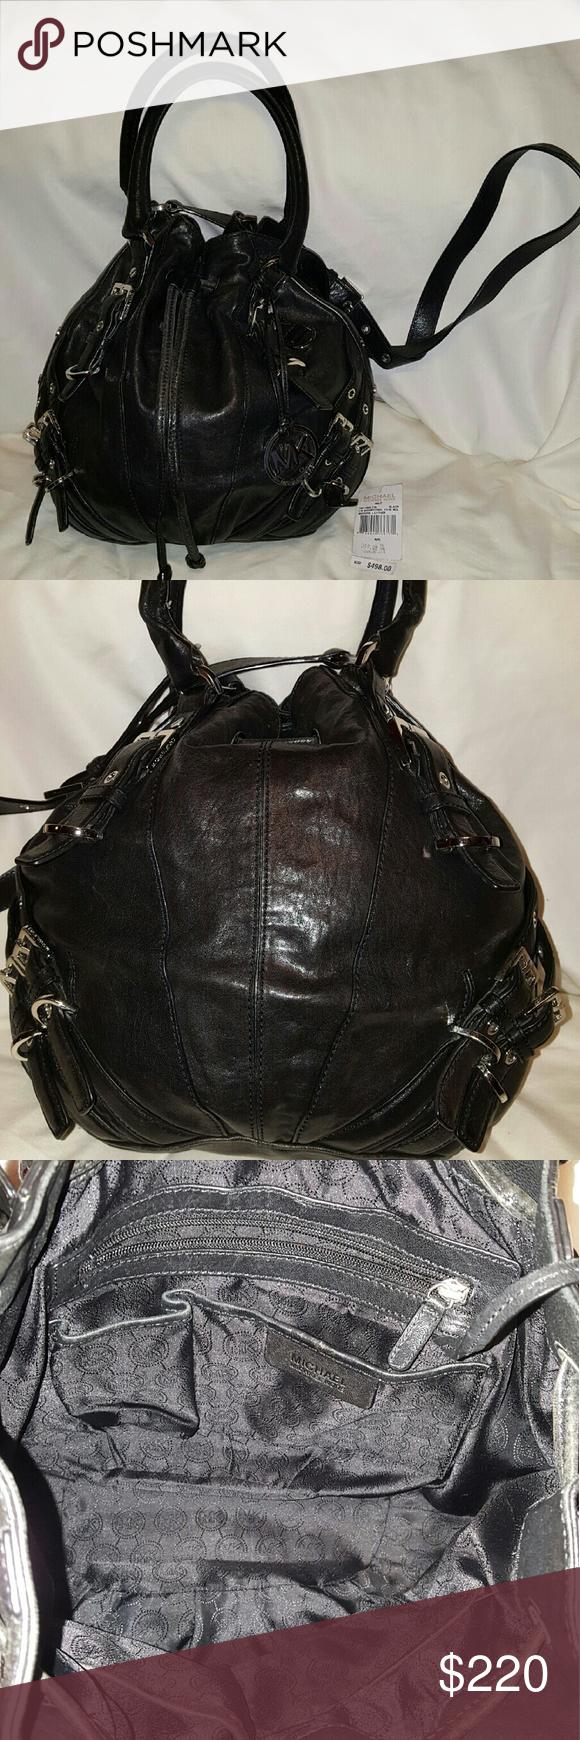 b7a39e2be37c switzerland michael kors milo drawstring tote handbags b90f2 d5344